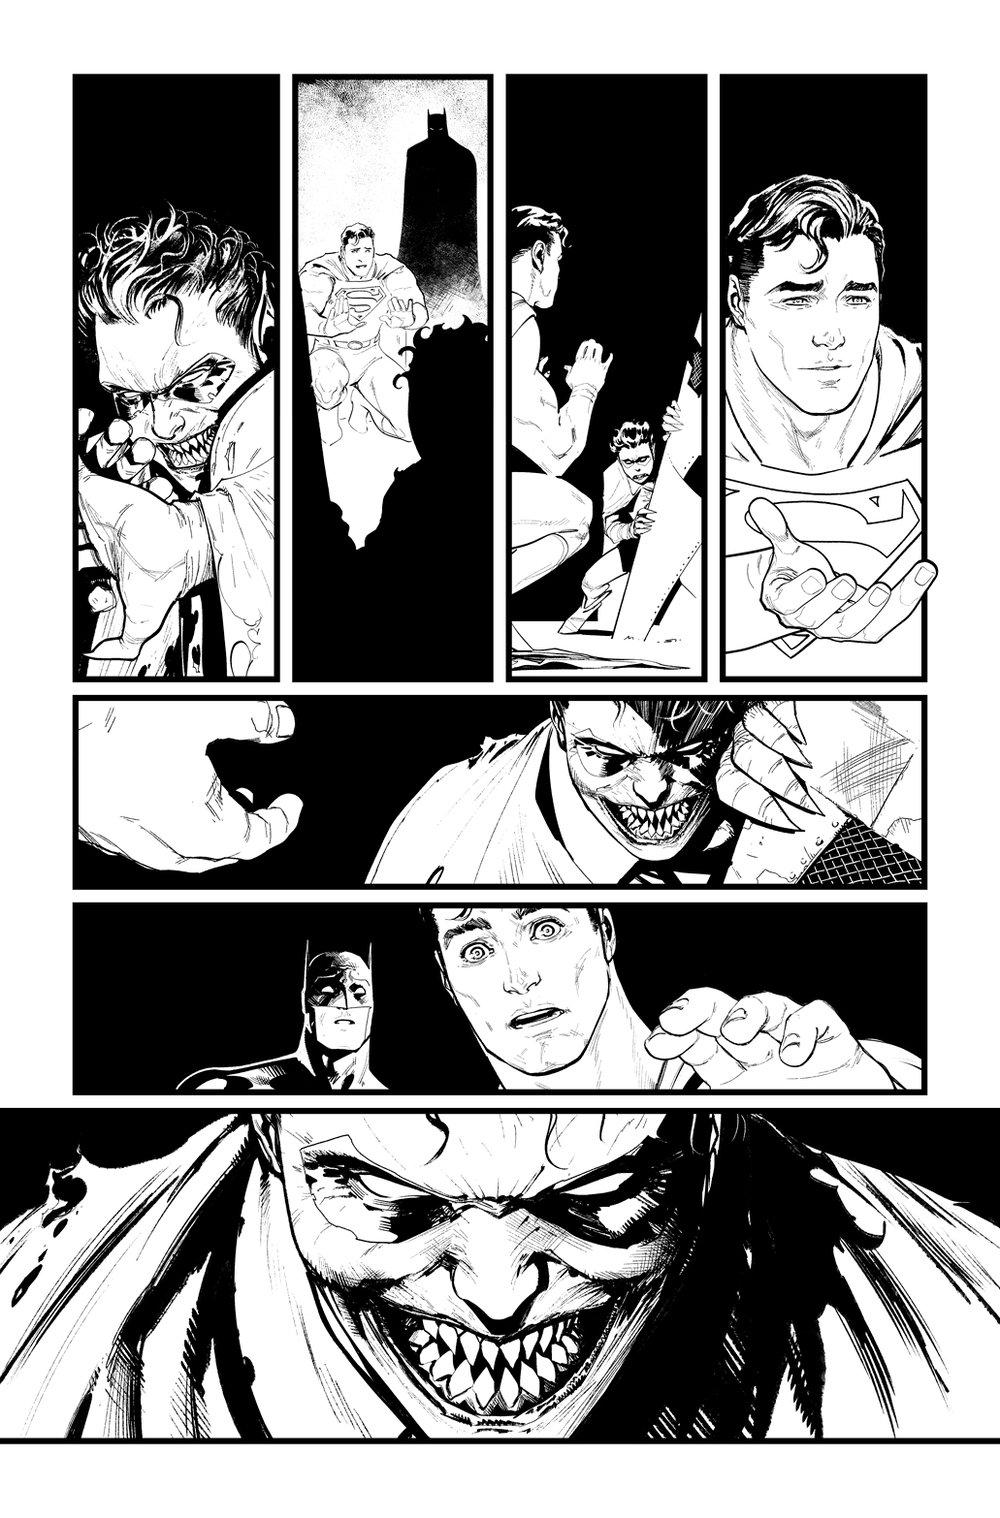 Image of BATMAN/SUPERMAN #1 p.19 ARTIST'S PROOF